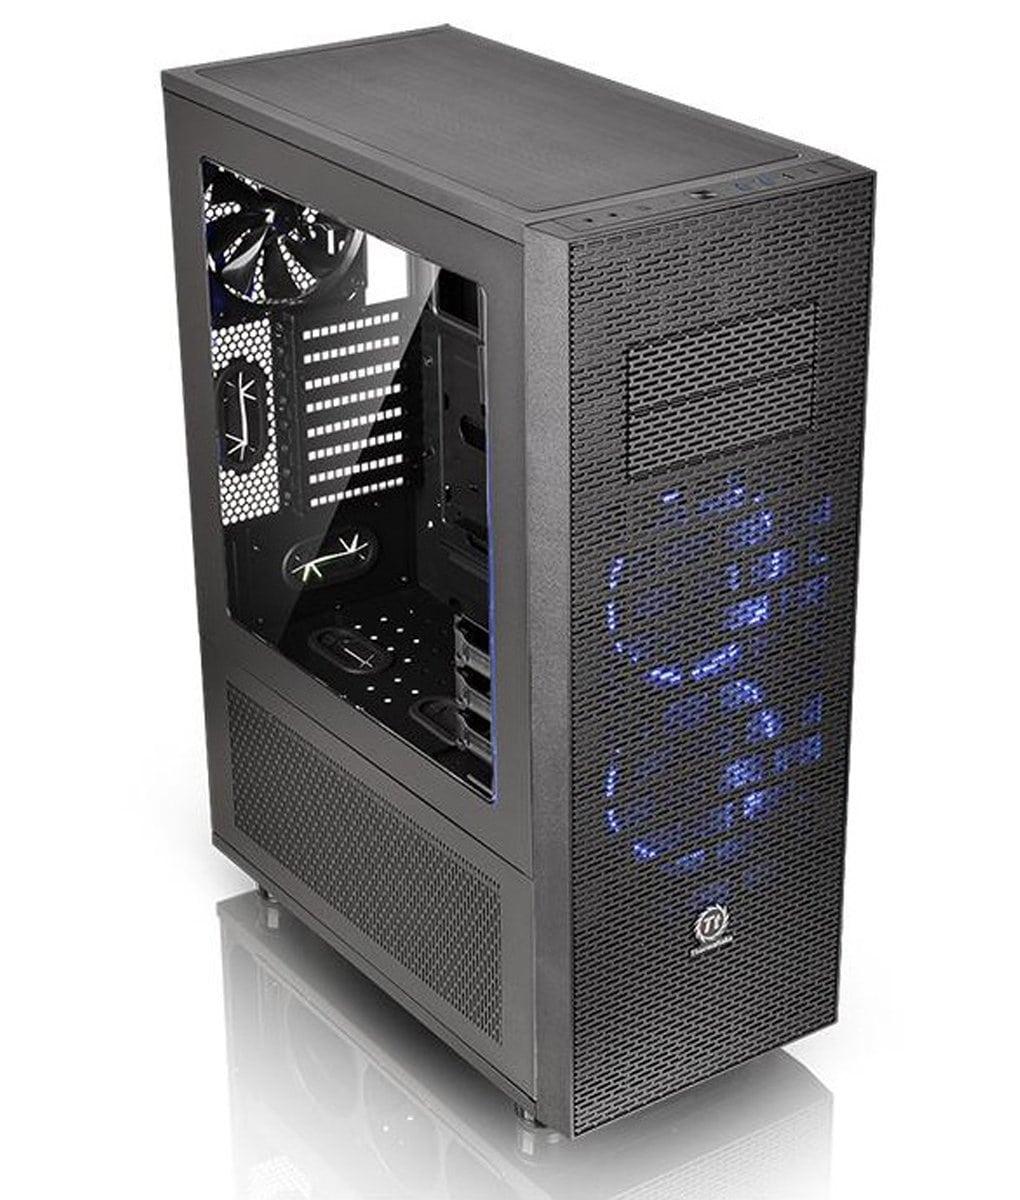 Adamant Custom 18X-Core Liquid Cooled Workstation Desktop PC